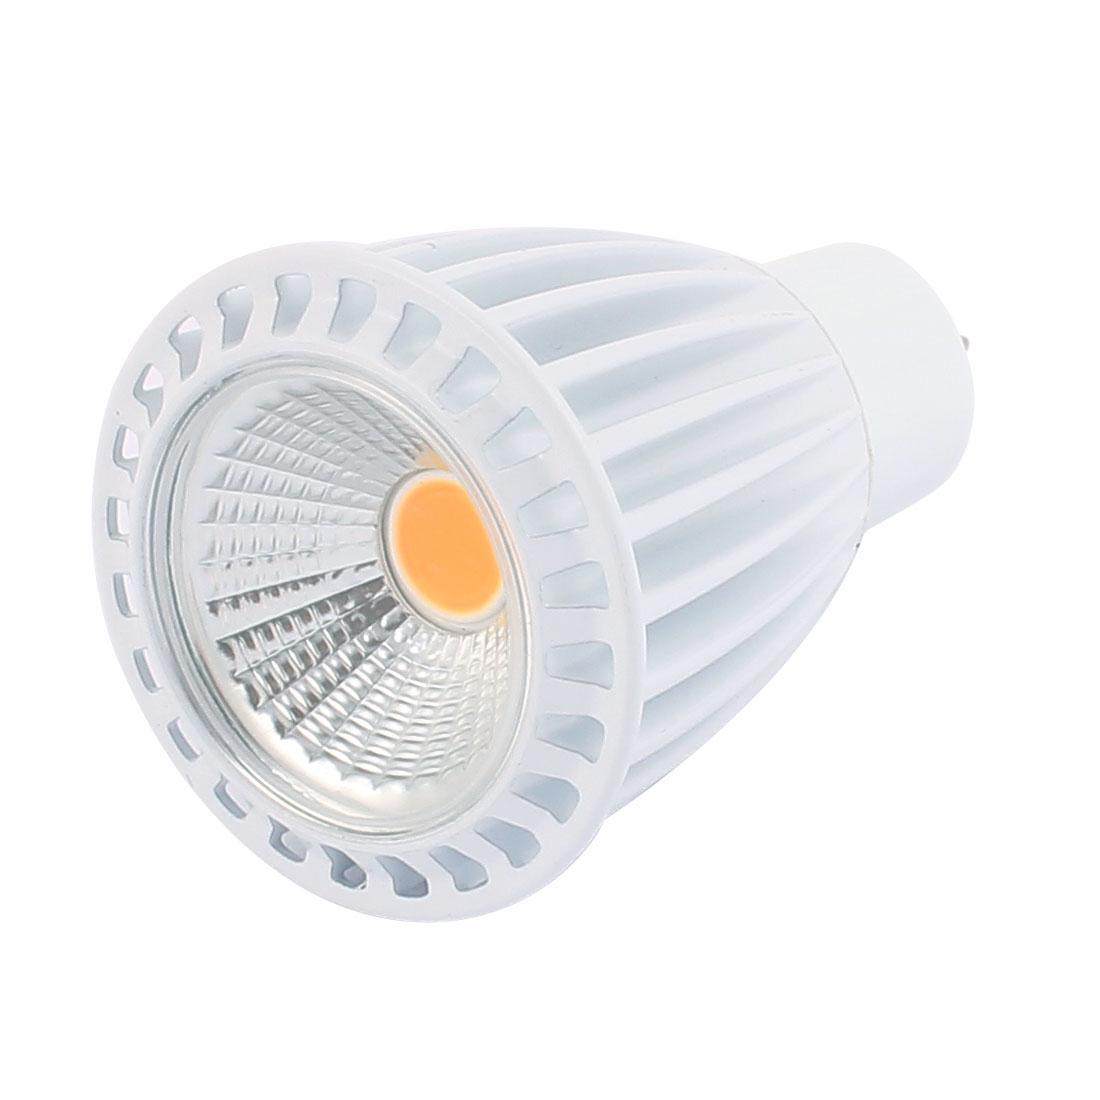 AC85-265V 7W Ultra Bright GU5.3 COB LED Spotlight Lamp Bulb Downlight Warm White